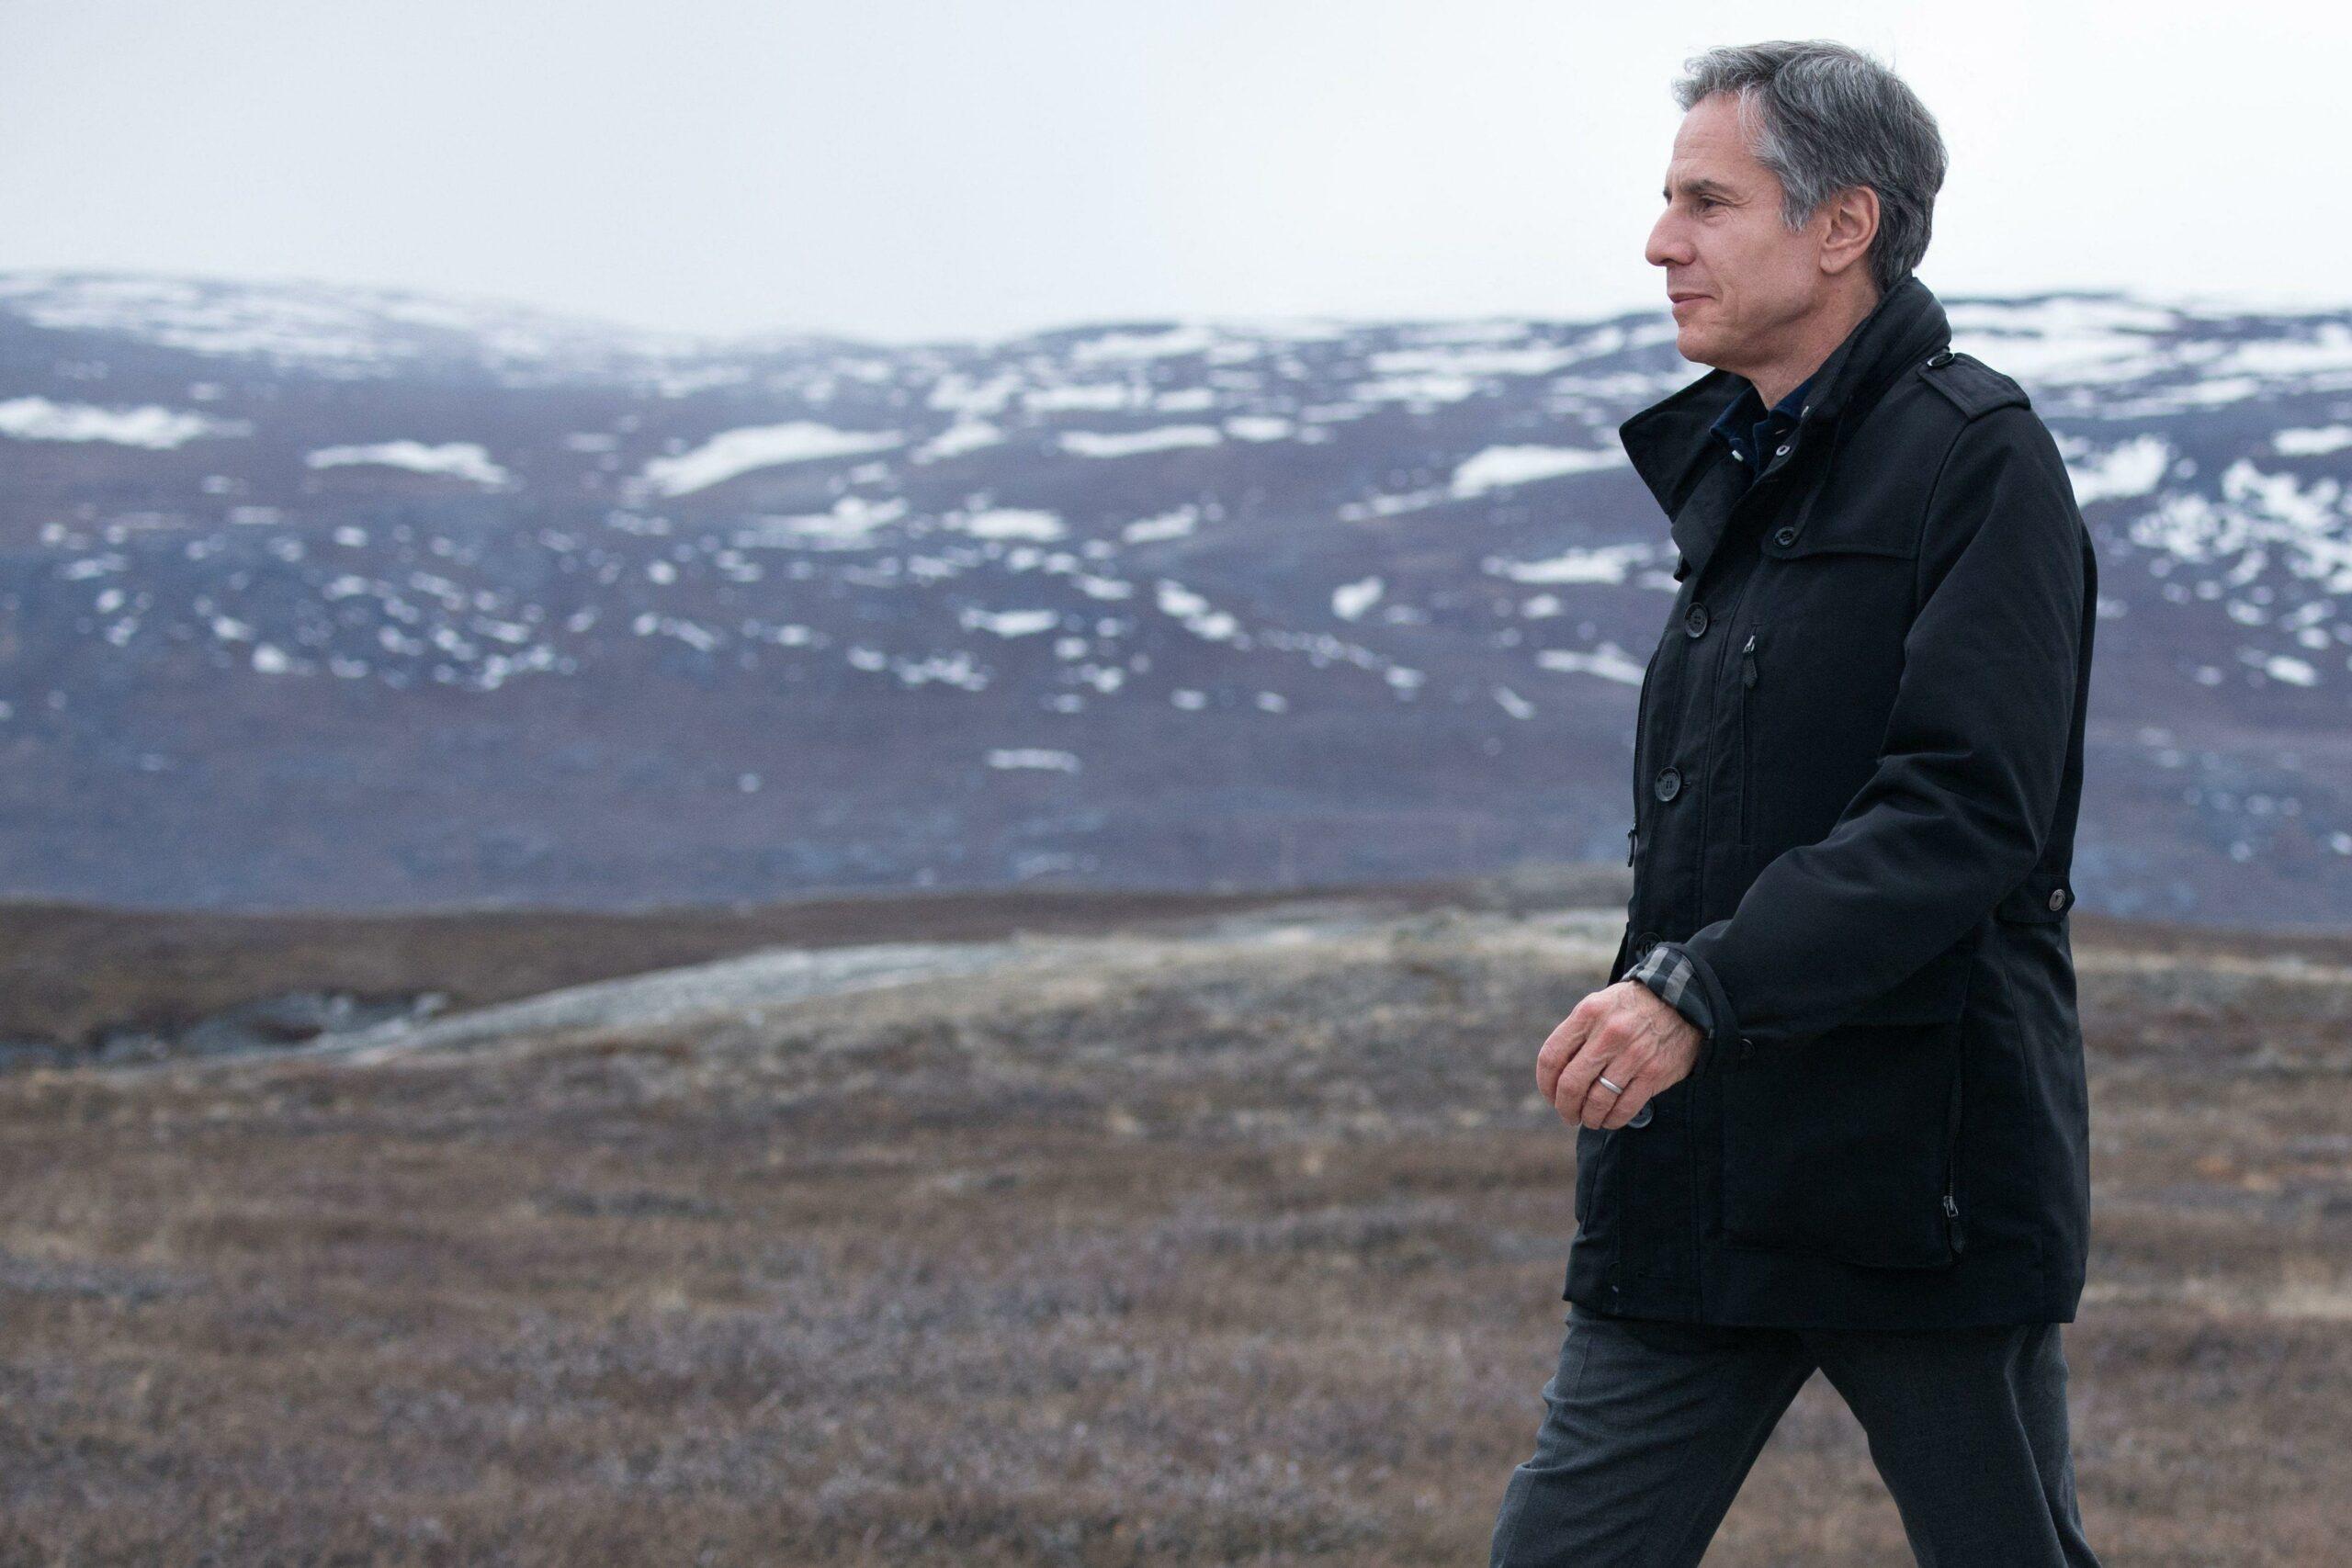 Blinken Says No to Greenland Real Estate